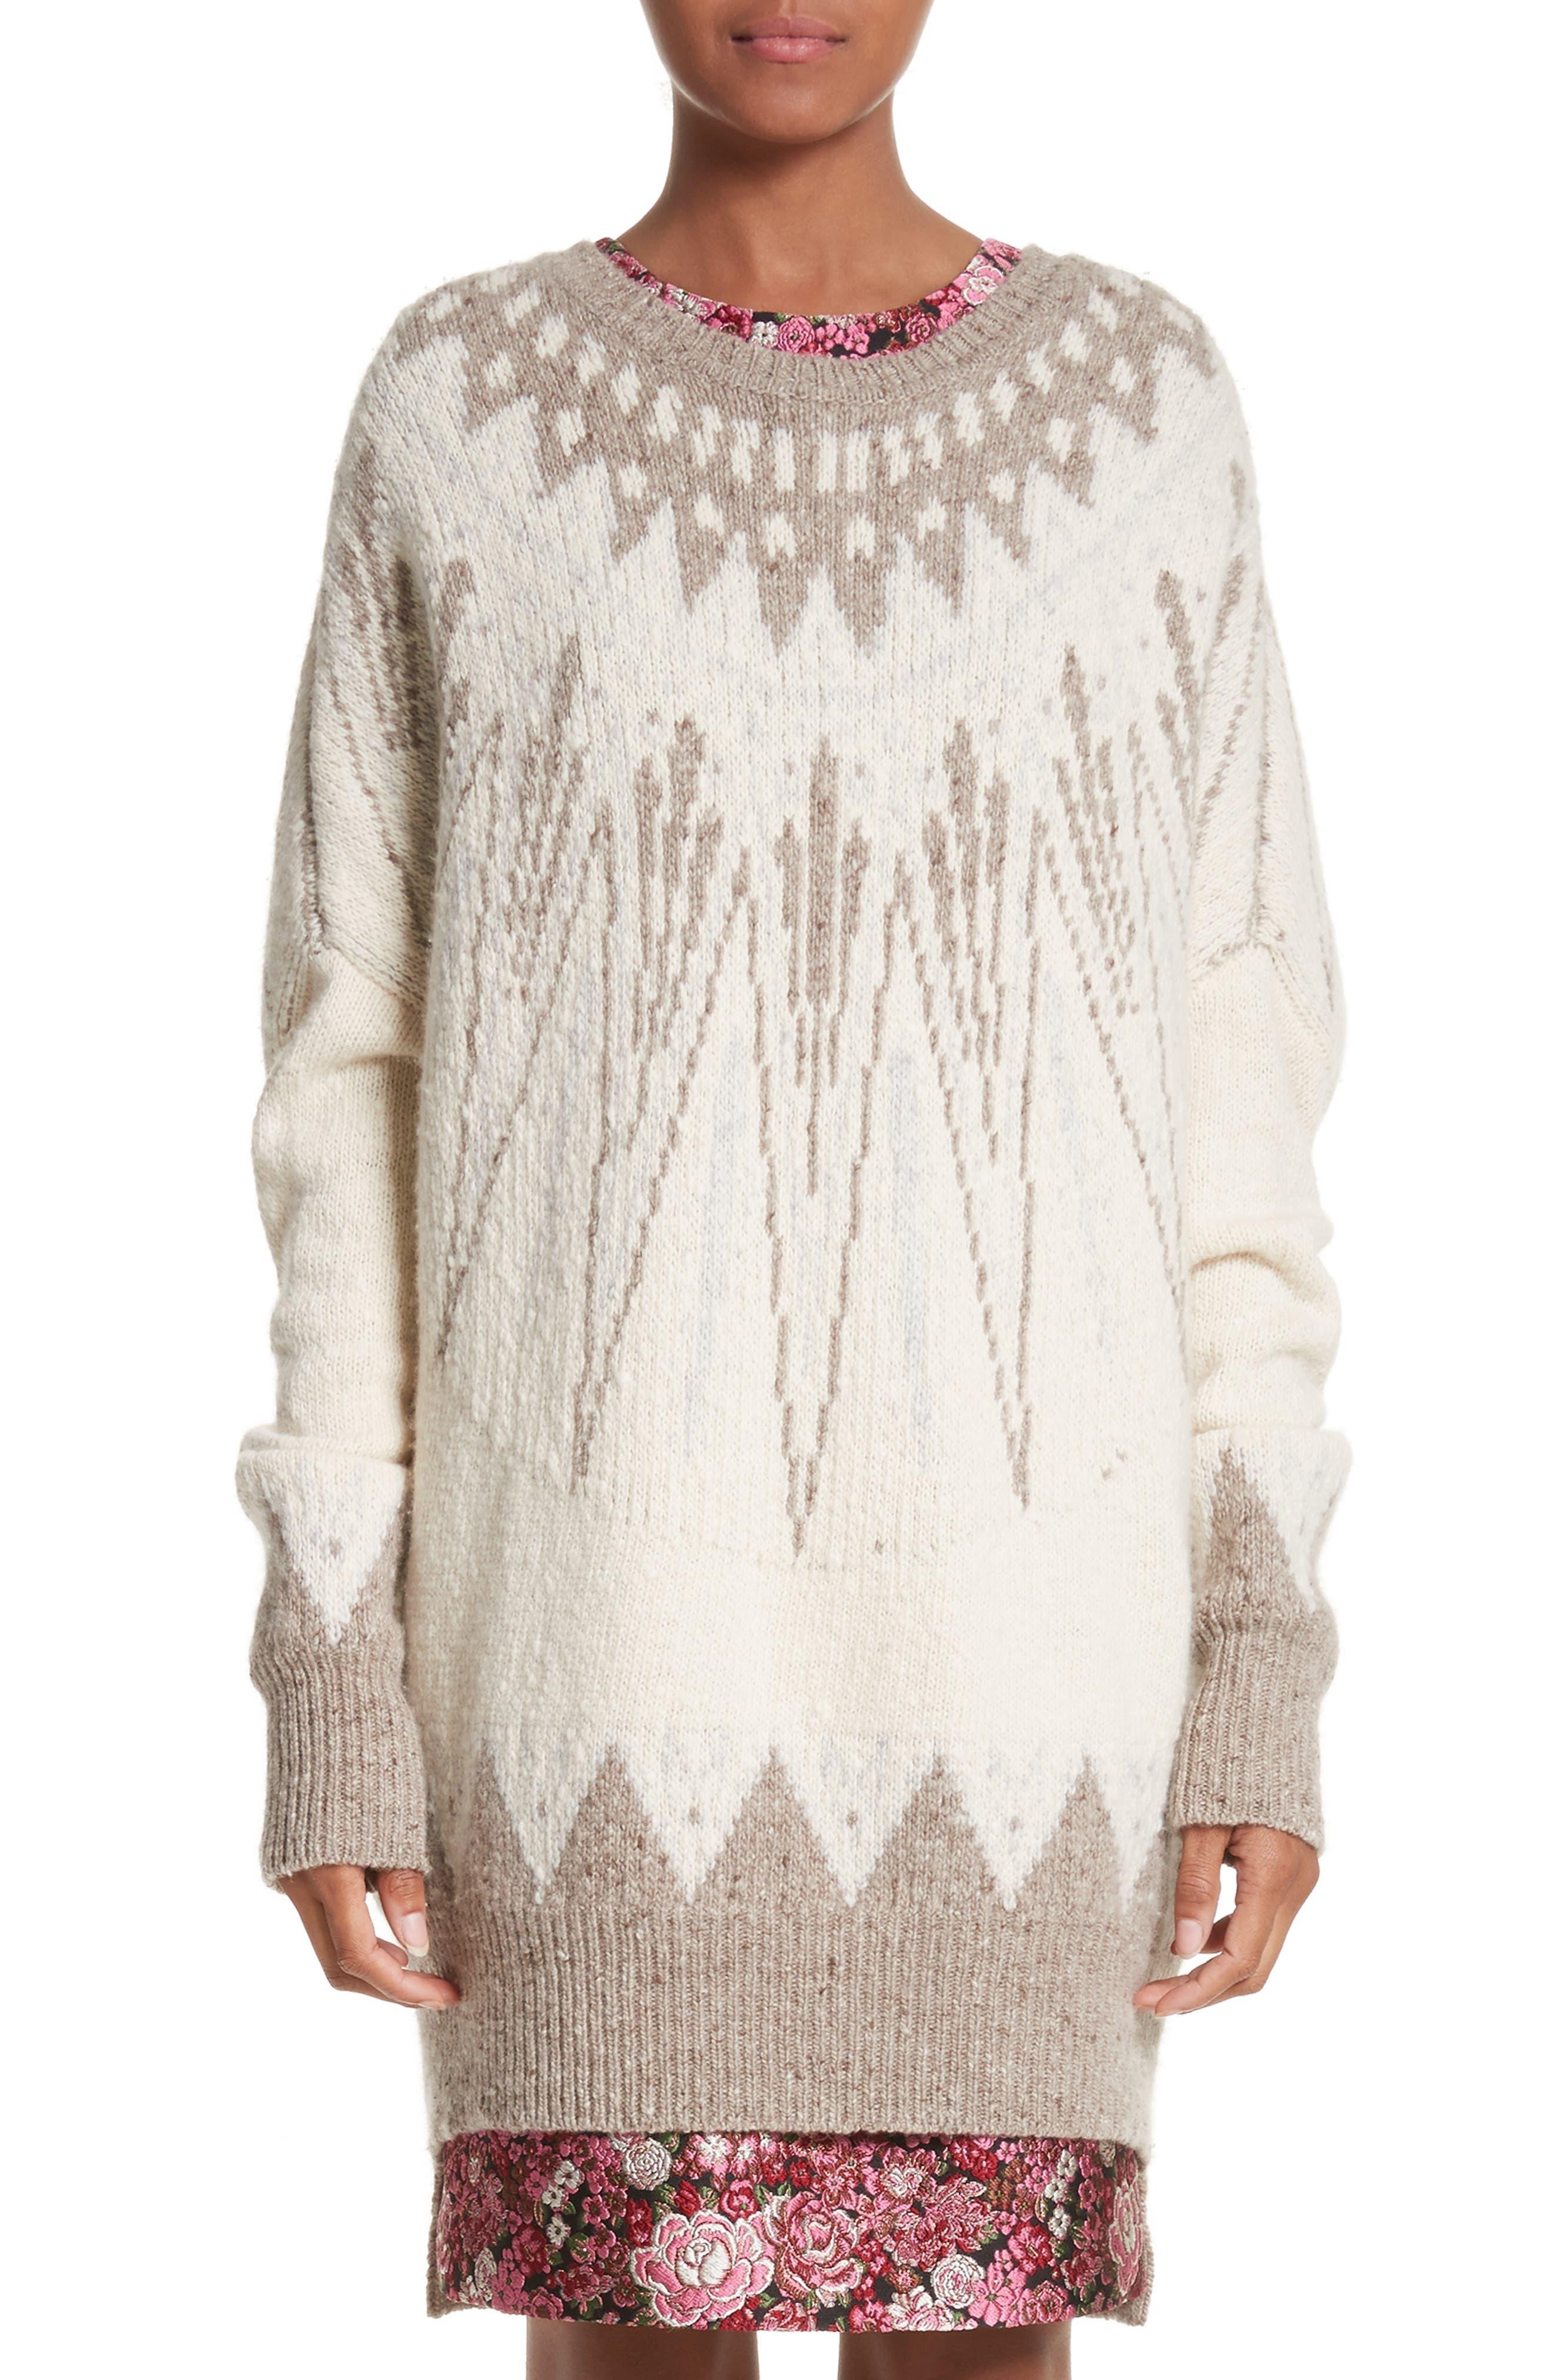 Adam Lippes Marled Merino Wool & Cashmere Fair Isle Sweater